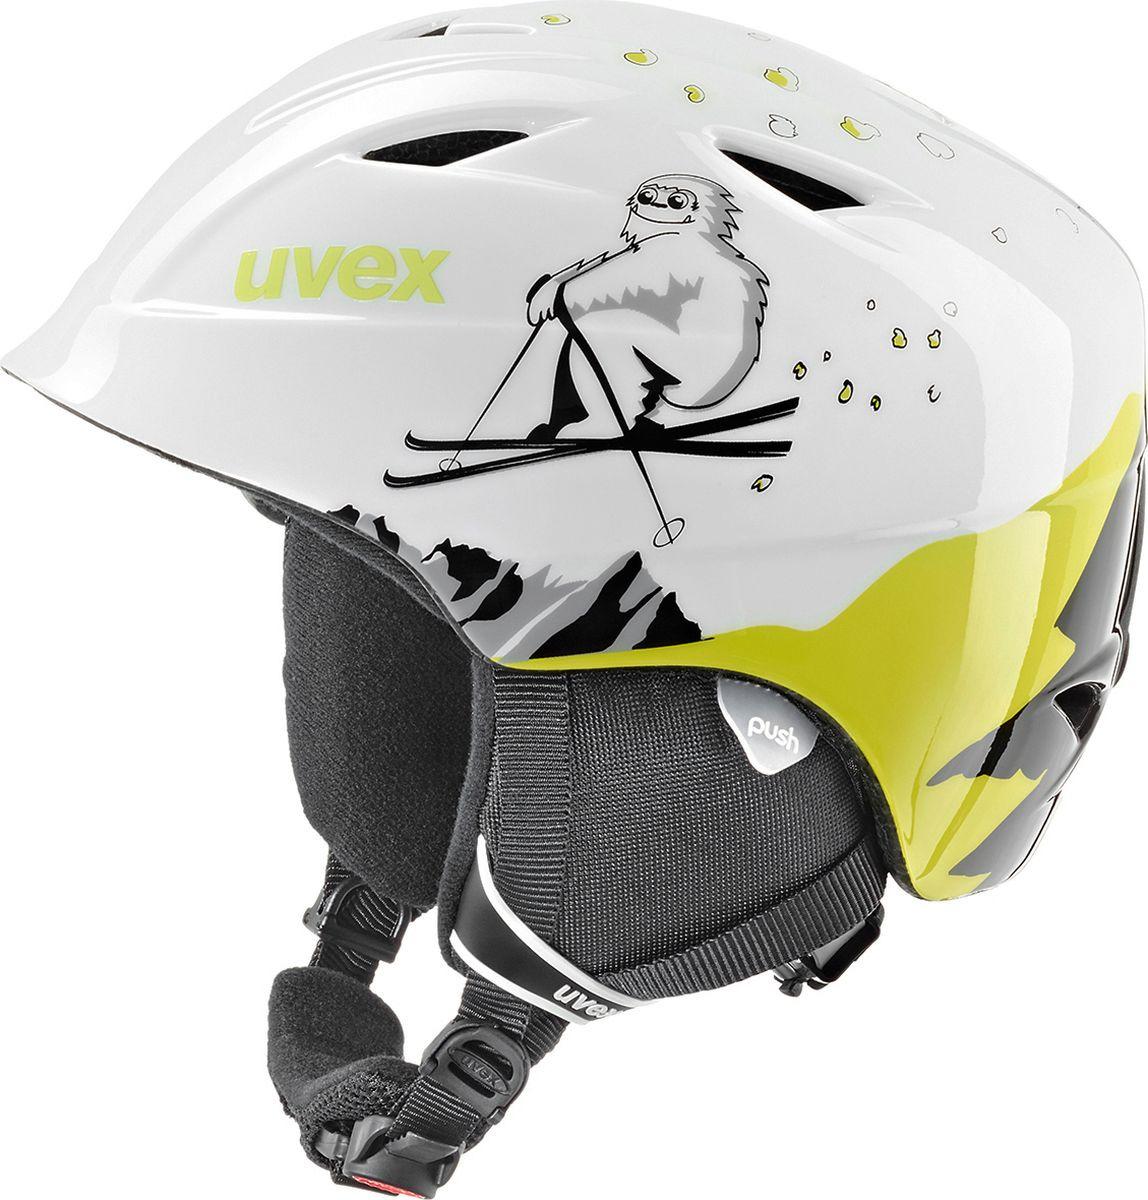 Шлем горнолыжный для мальчика Uvex Airwing 2 Kid's Helmet, 6132-16, зеленый. Размер XXS шлем горнолыжный для мальчика uvex airwing 2 kid s helmet 6132 46 синий размер xxs